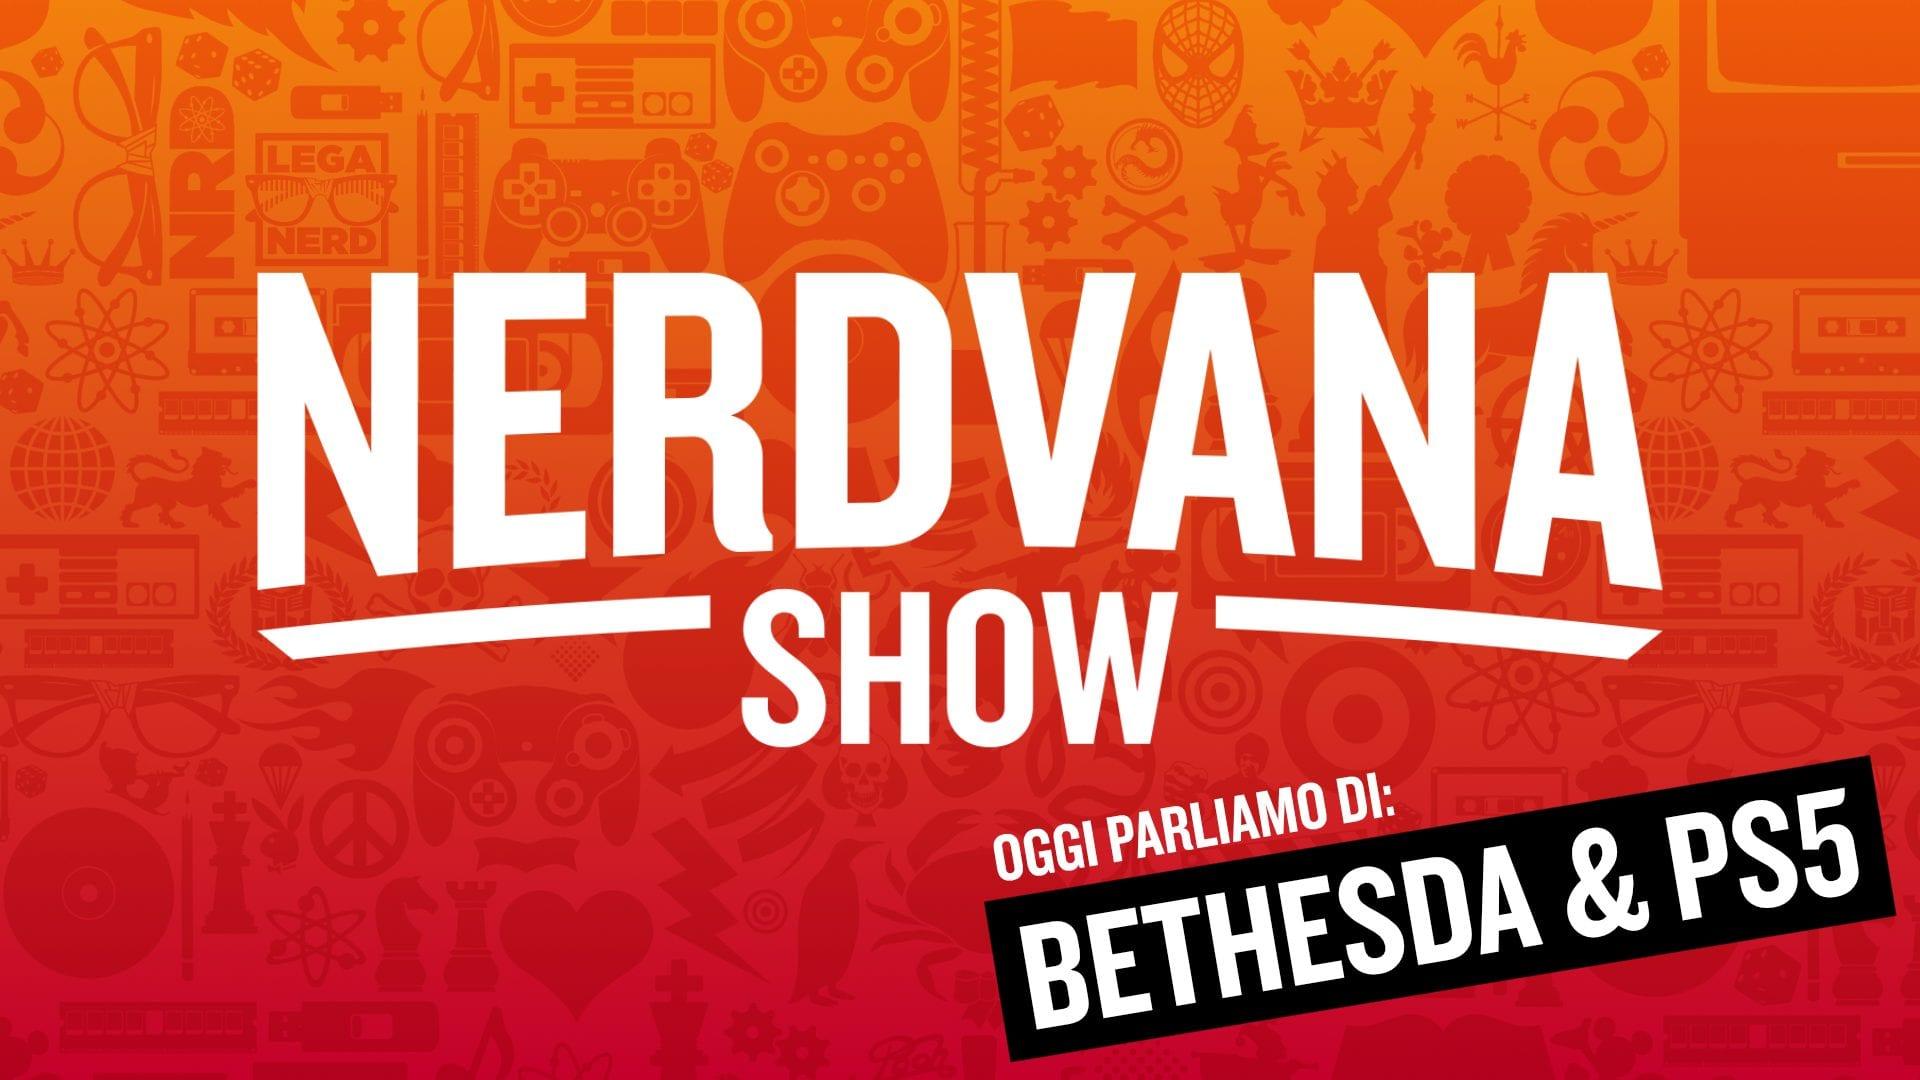 Bethesda, Microsoft, Sony, Netflix e il futuro dell'intrattenimento - Nerdvana Show 15